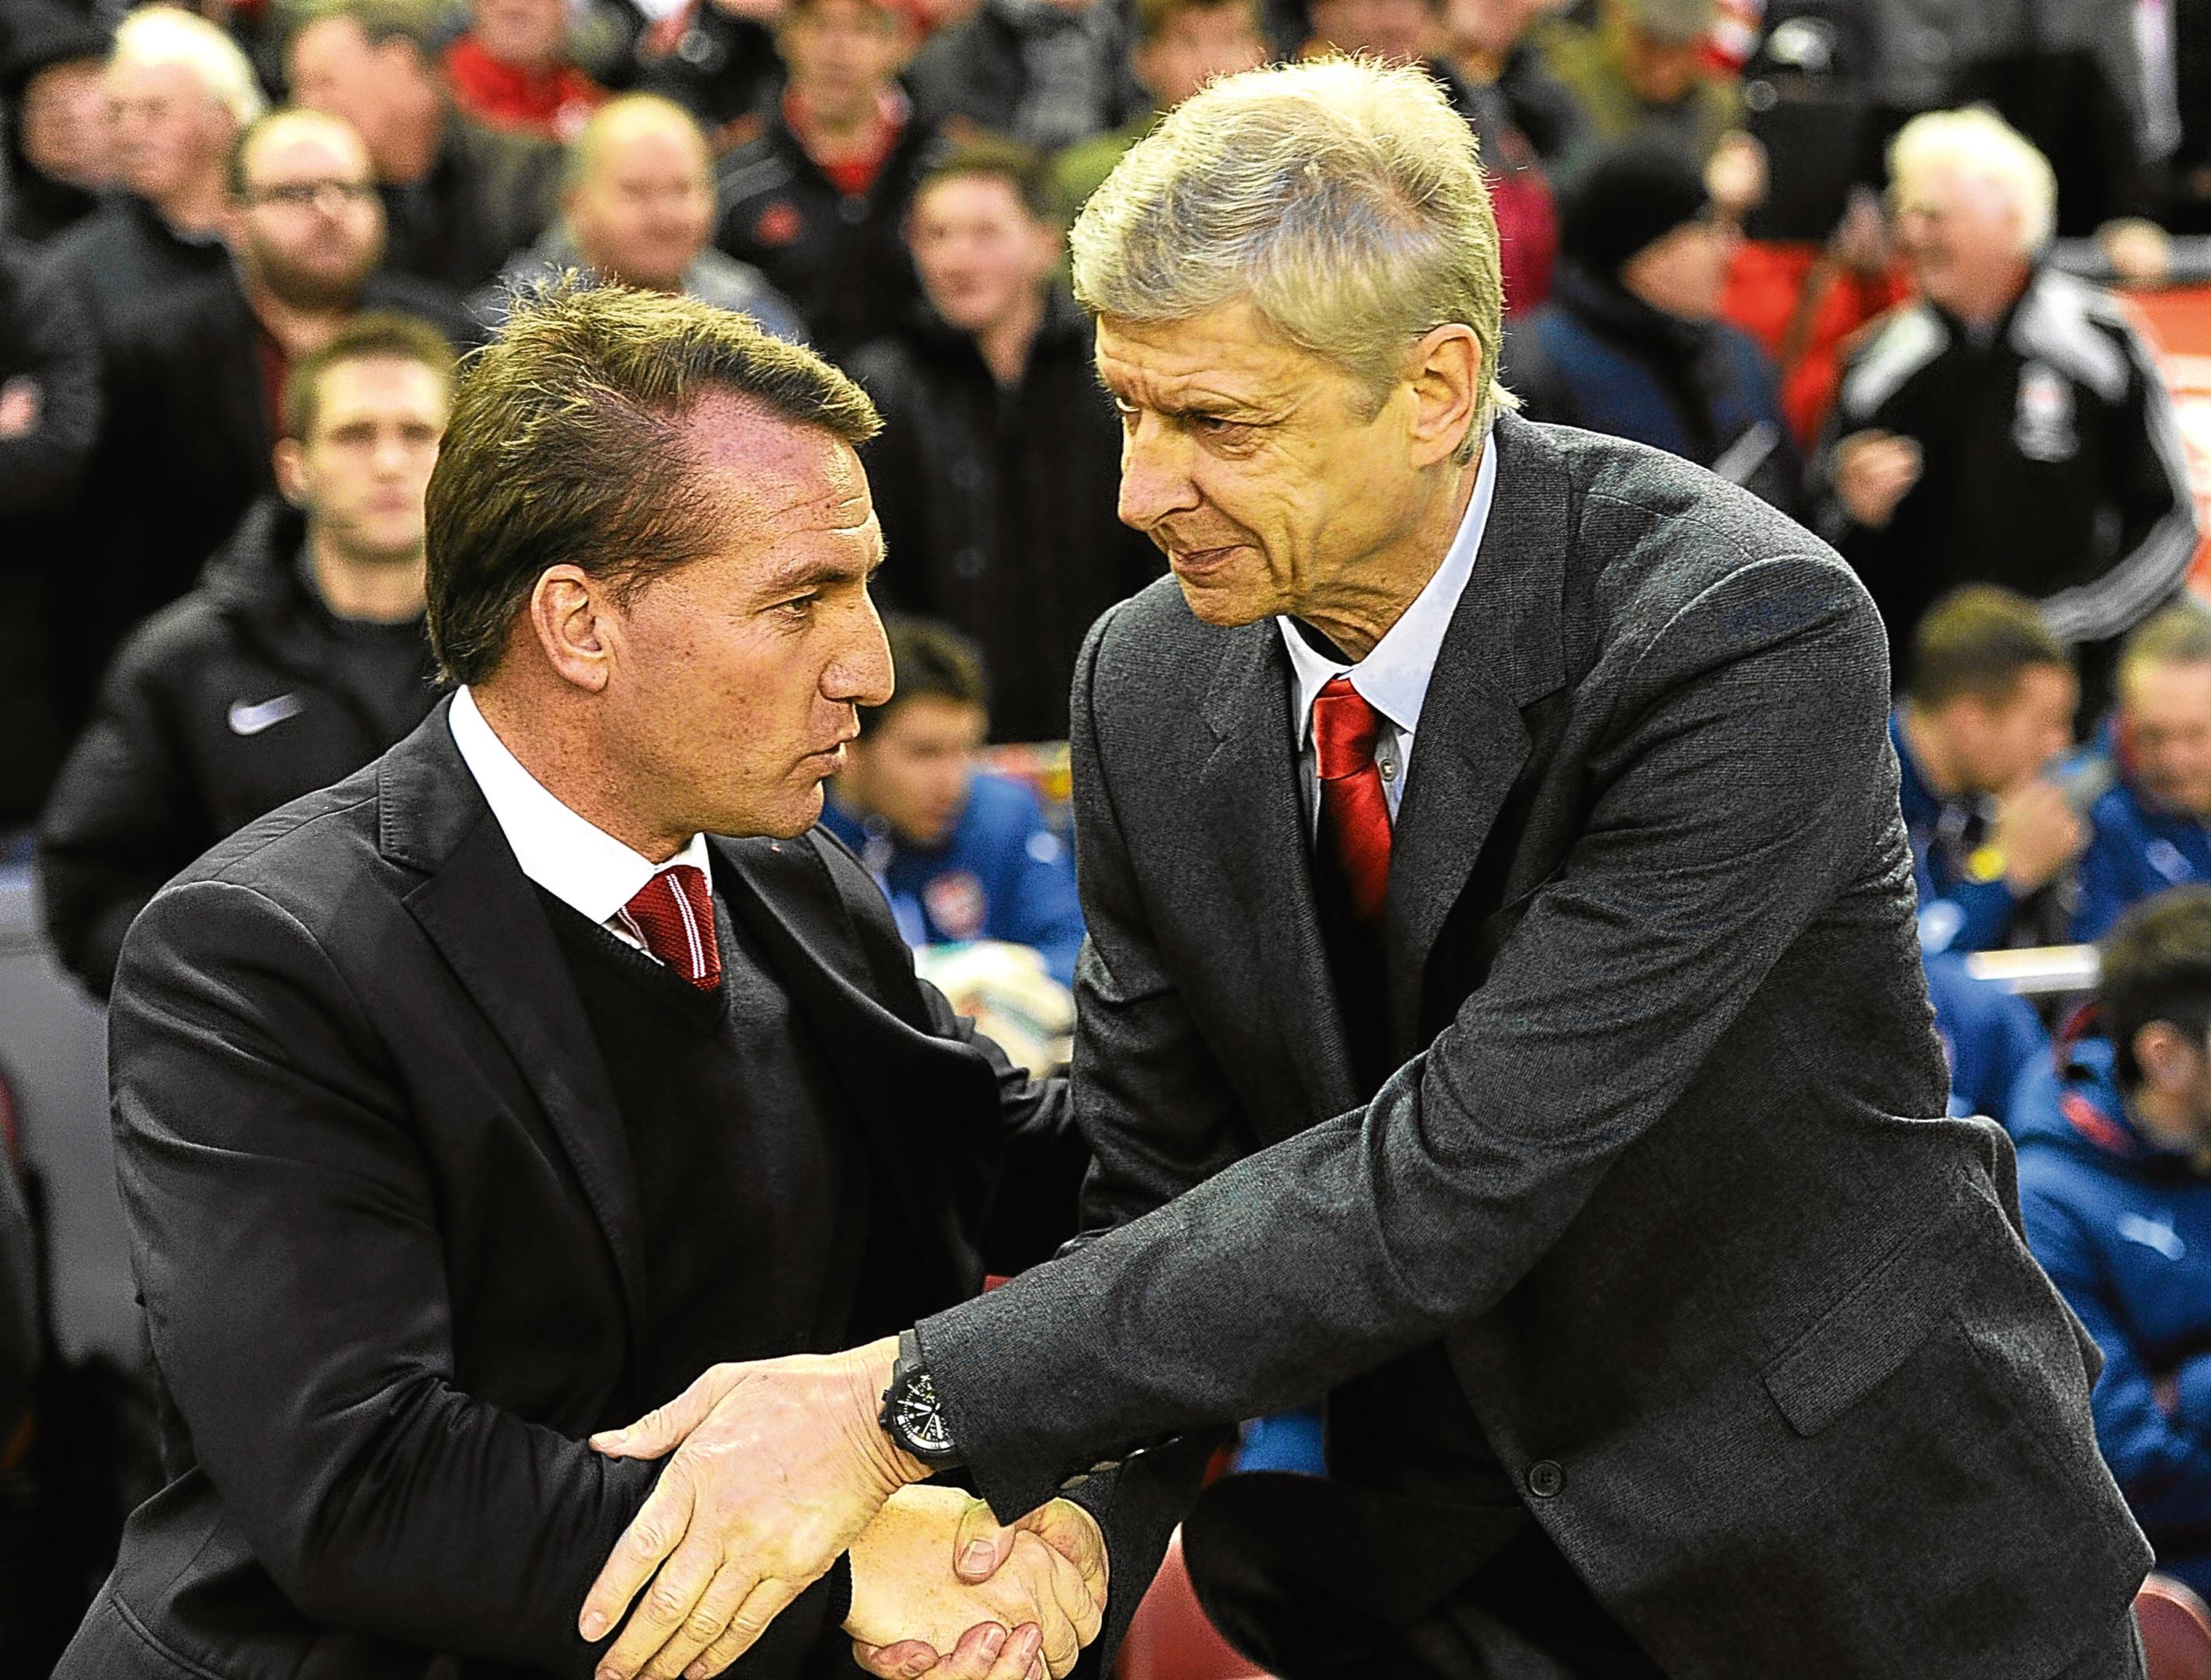 (John Powell/Liverpool FC via Getty Images)